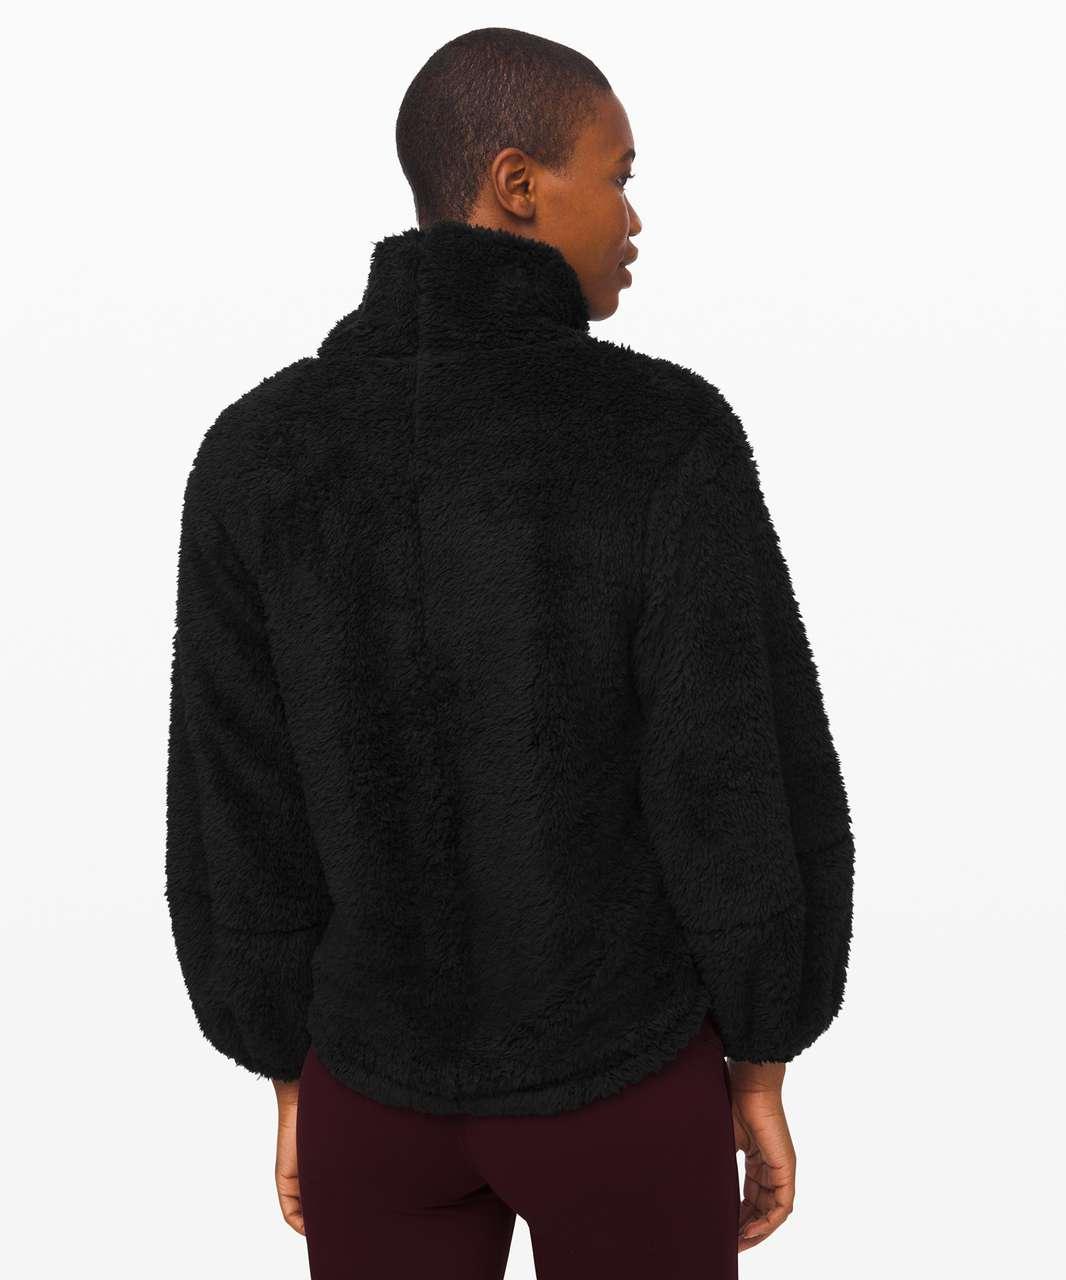 Lululemon Warmth Restore Sherpa Pullover - Black